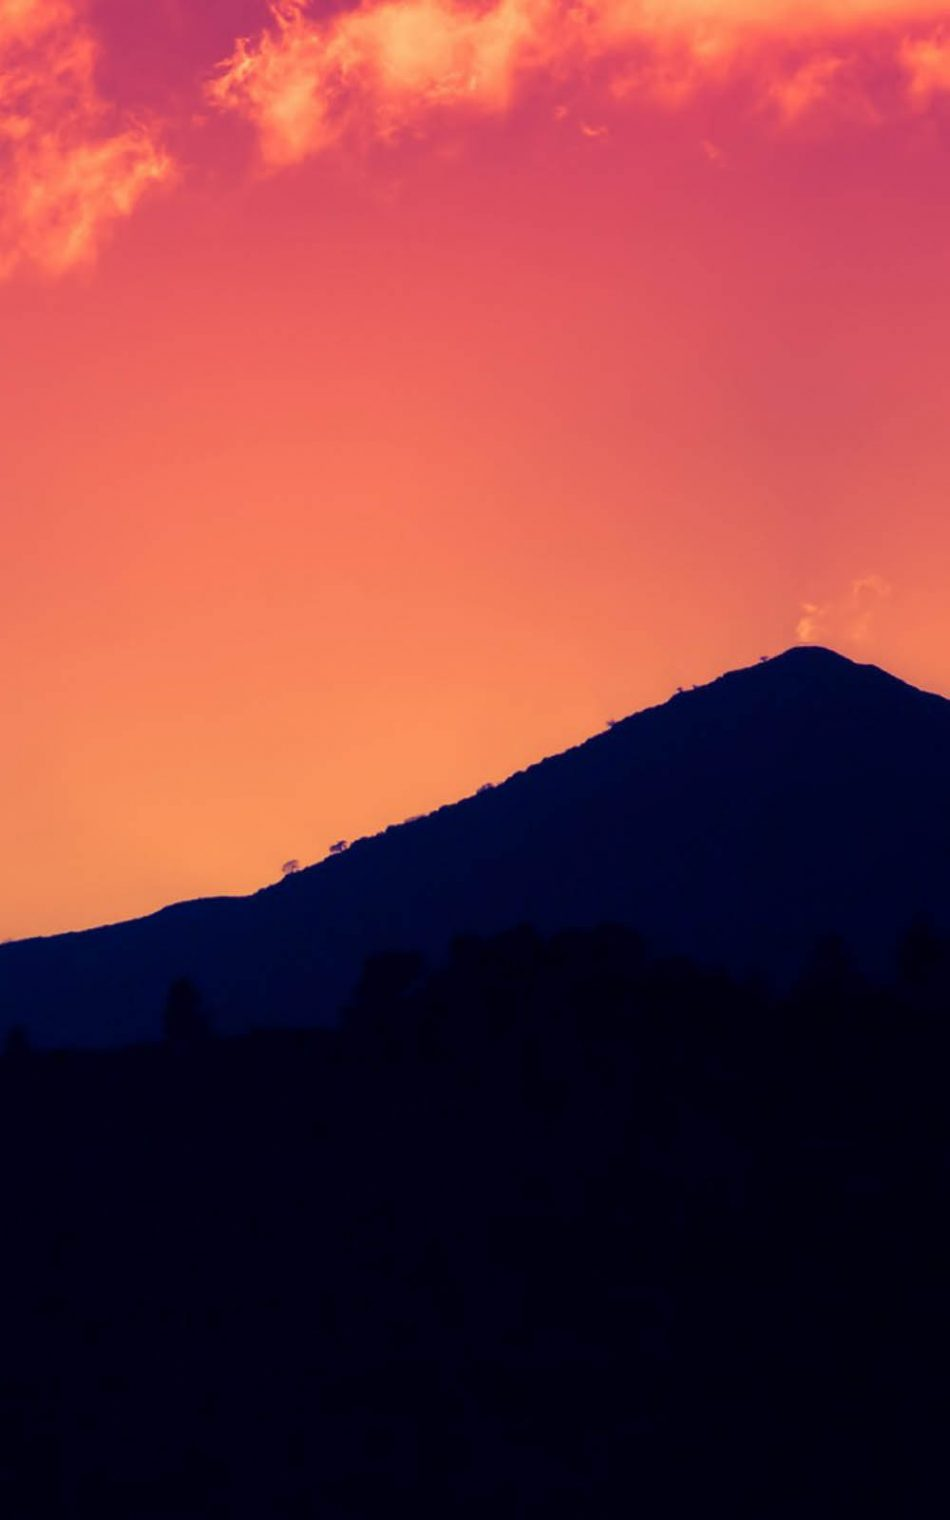 Cool Wallpaper Mountain Dark - Sunset-Dark-Mountains-Italy-HD-Mobile-Wallpaper-950x1520  2018_75904.jpg